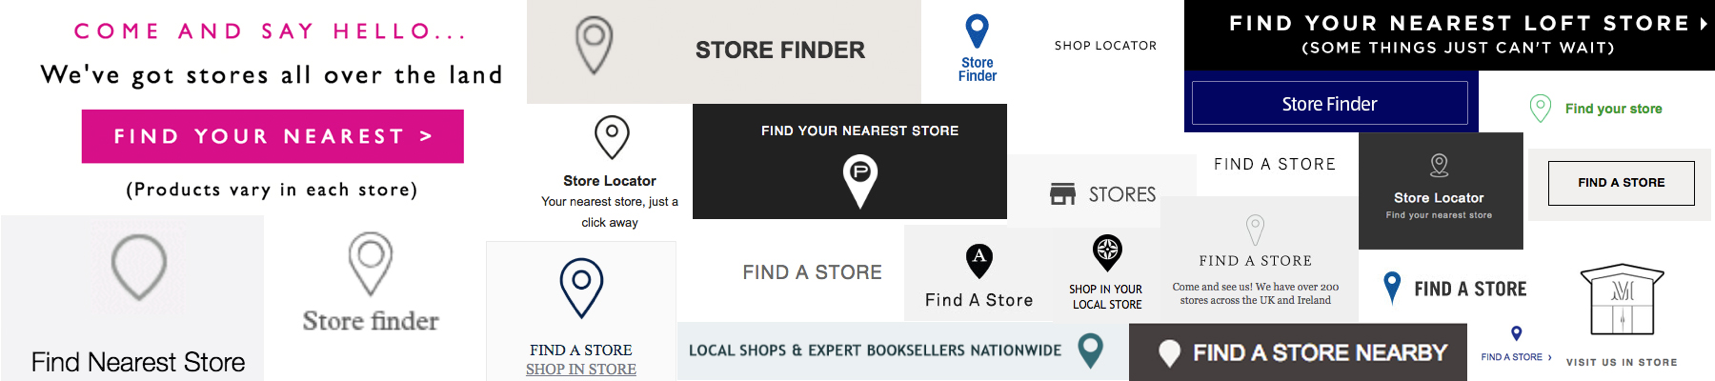 Nearest stores